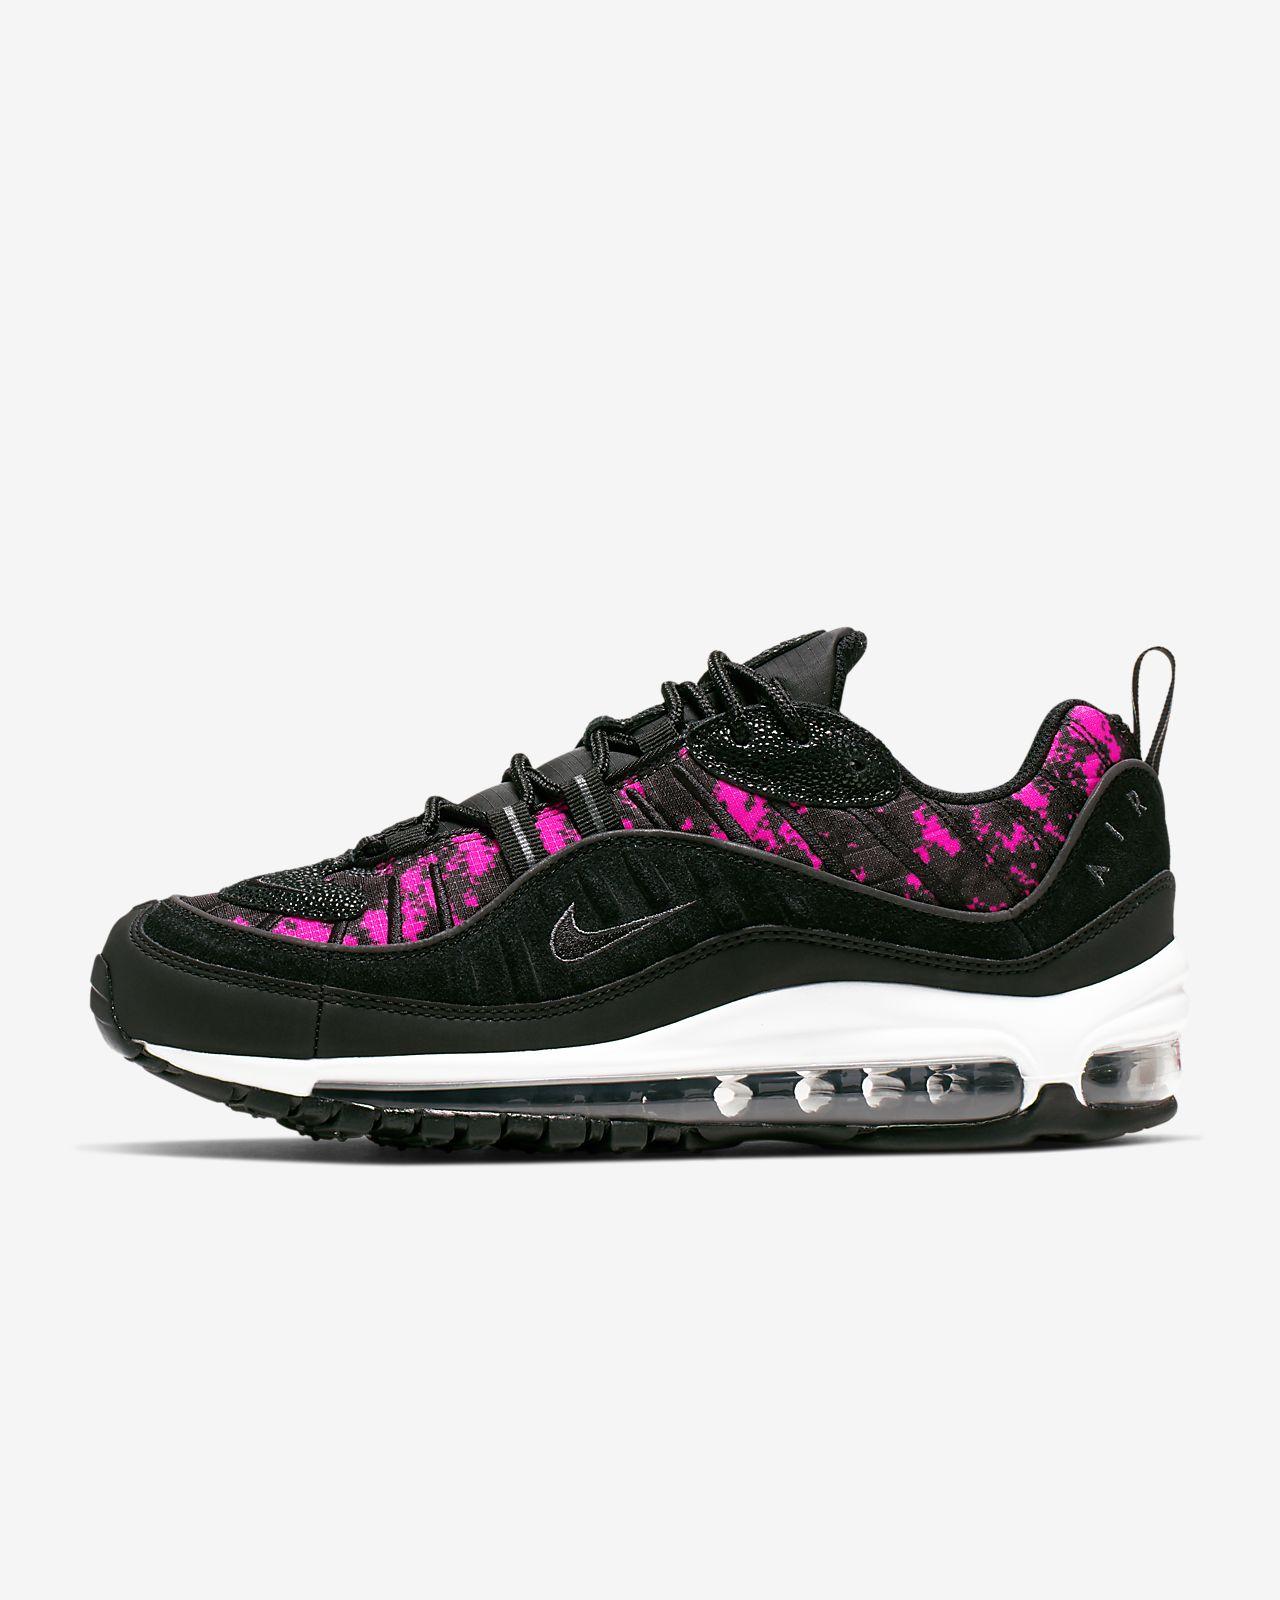 Nike Air Max 98 Premium Camo Damenschuh